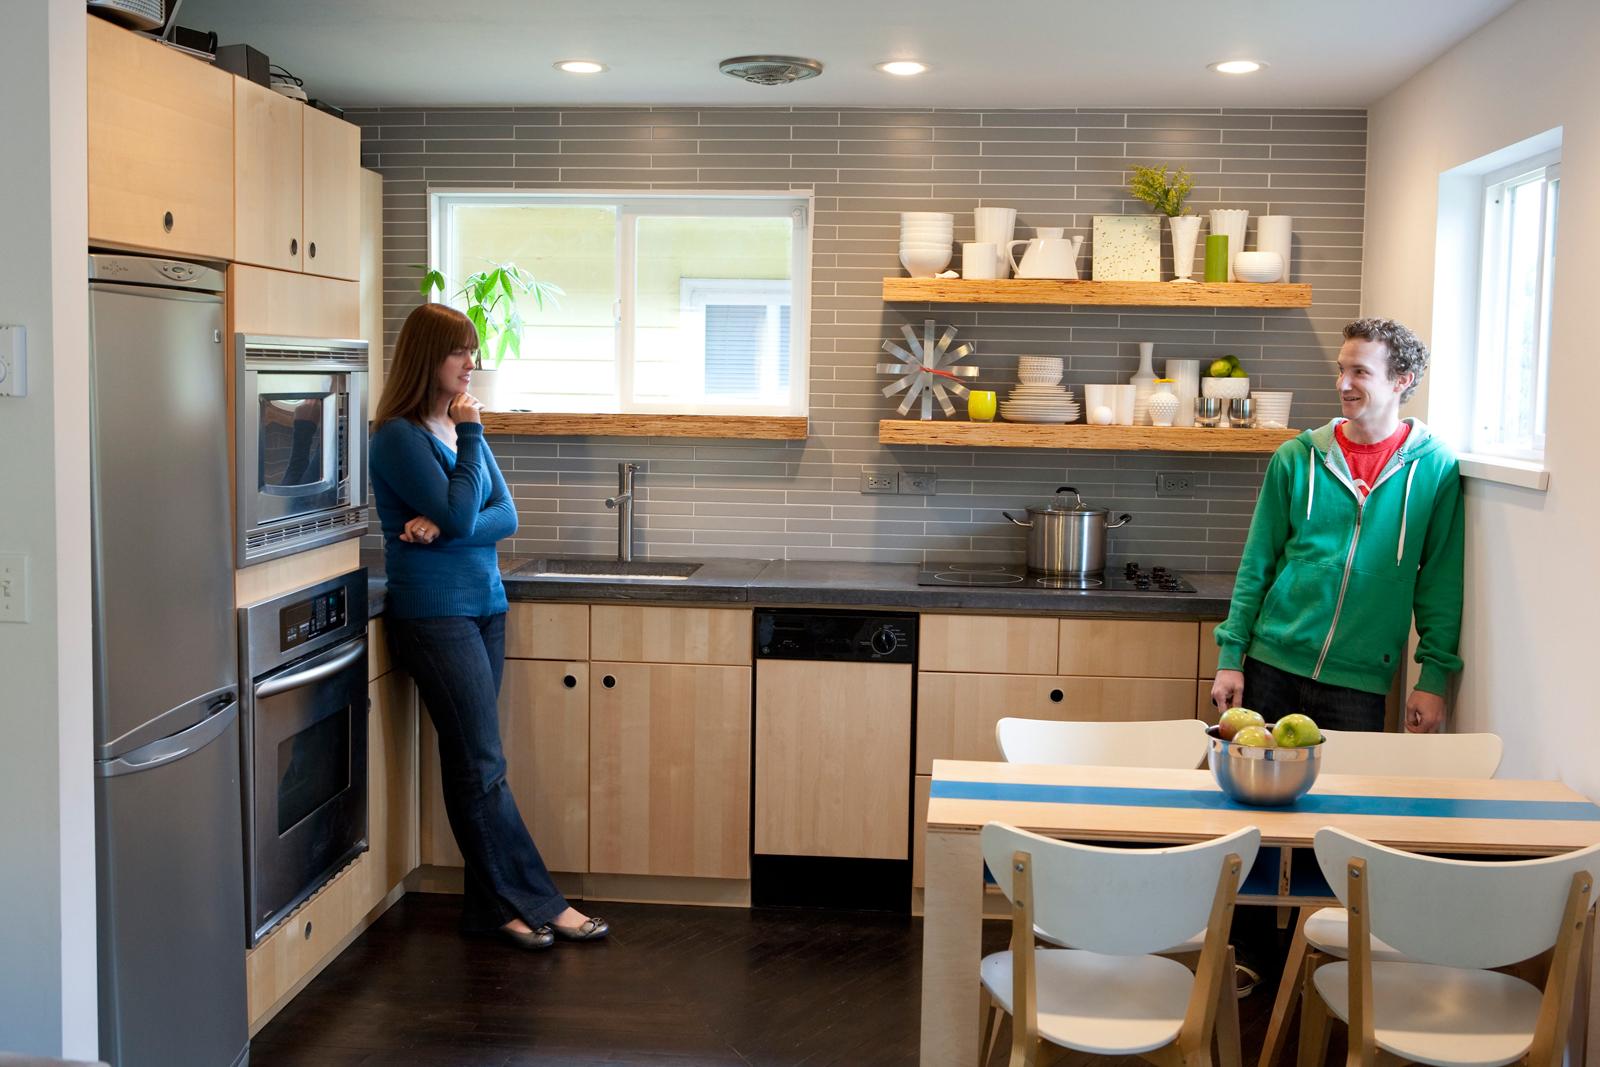 Linden residence kitchen portrait